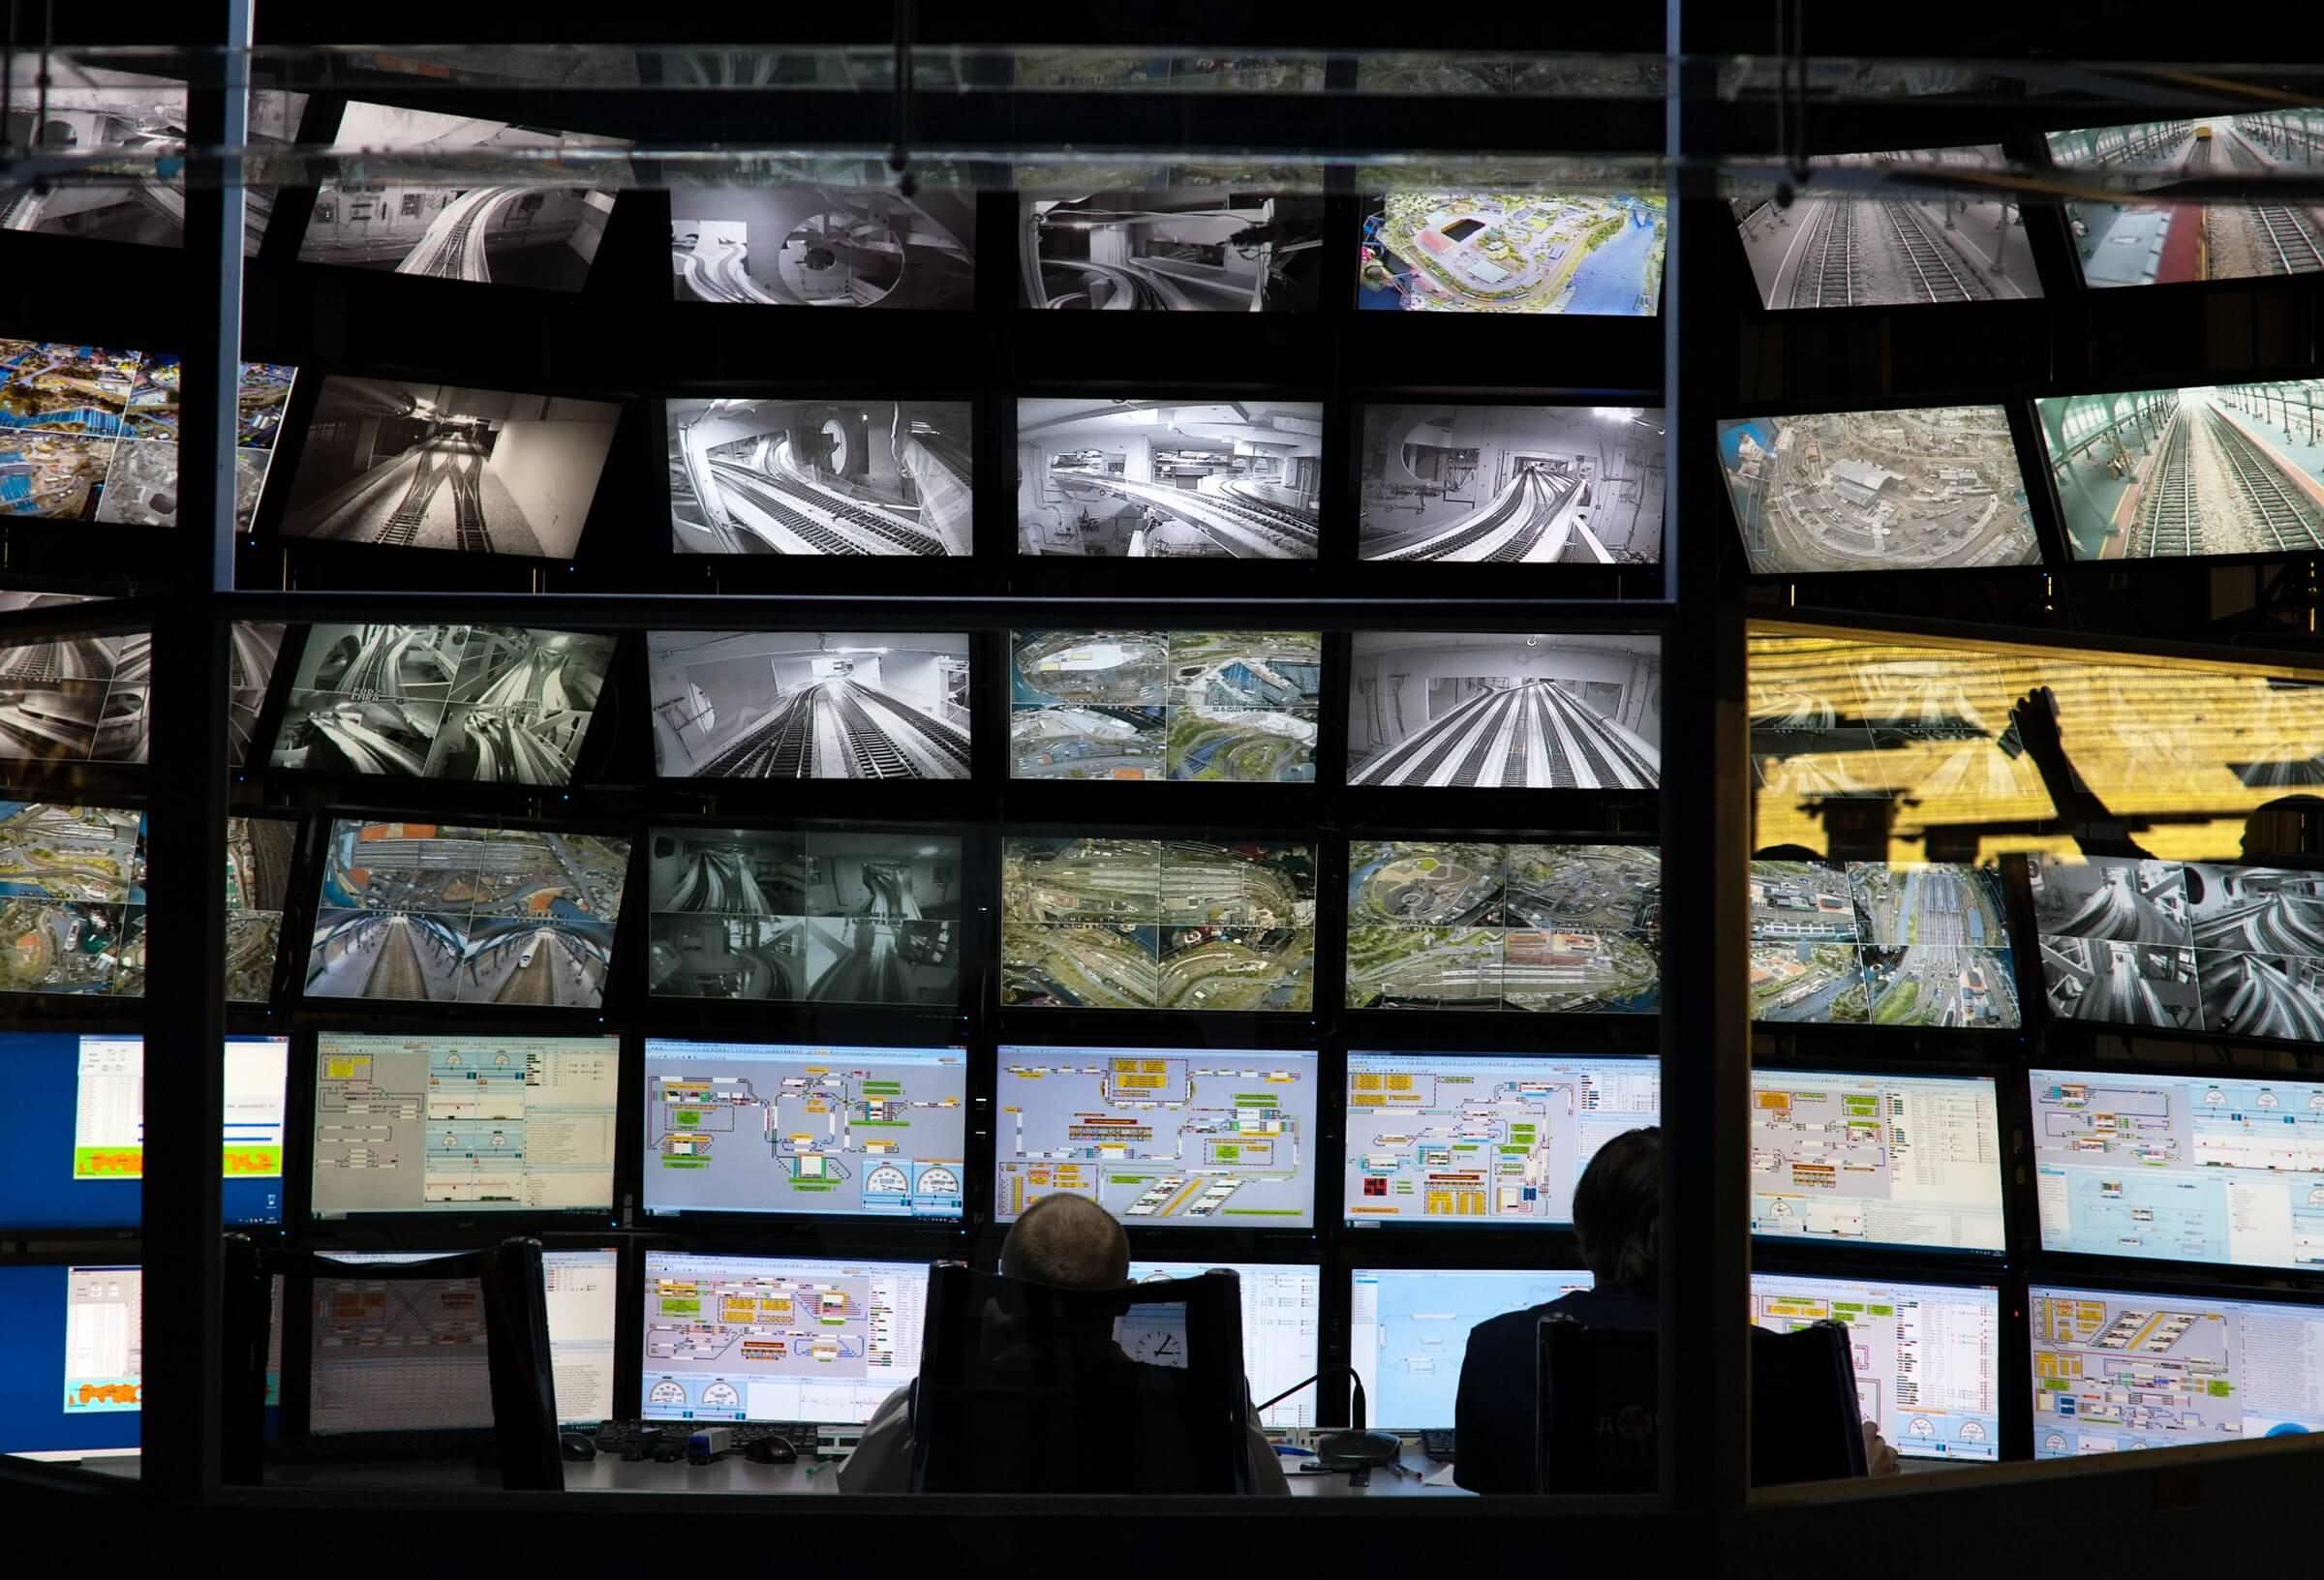 alarm system control room